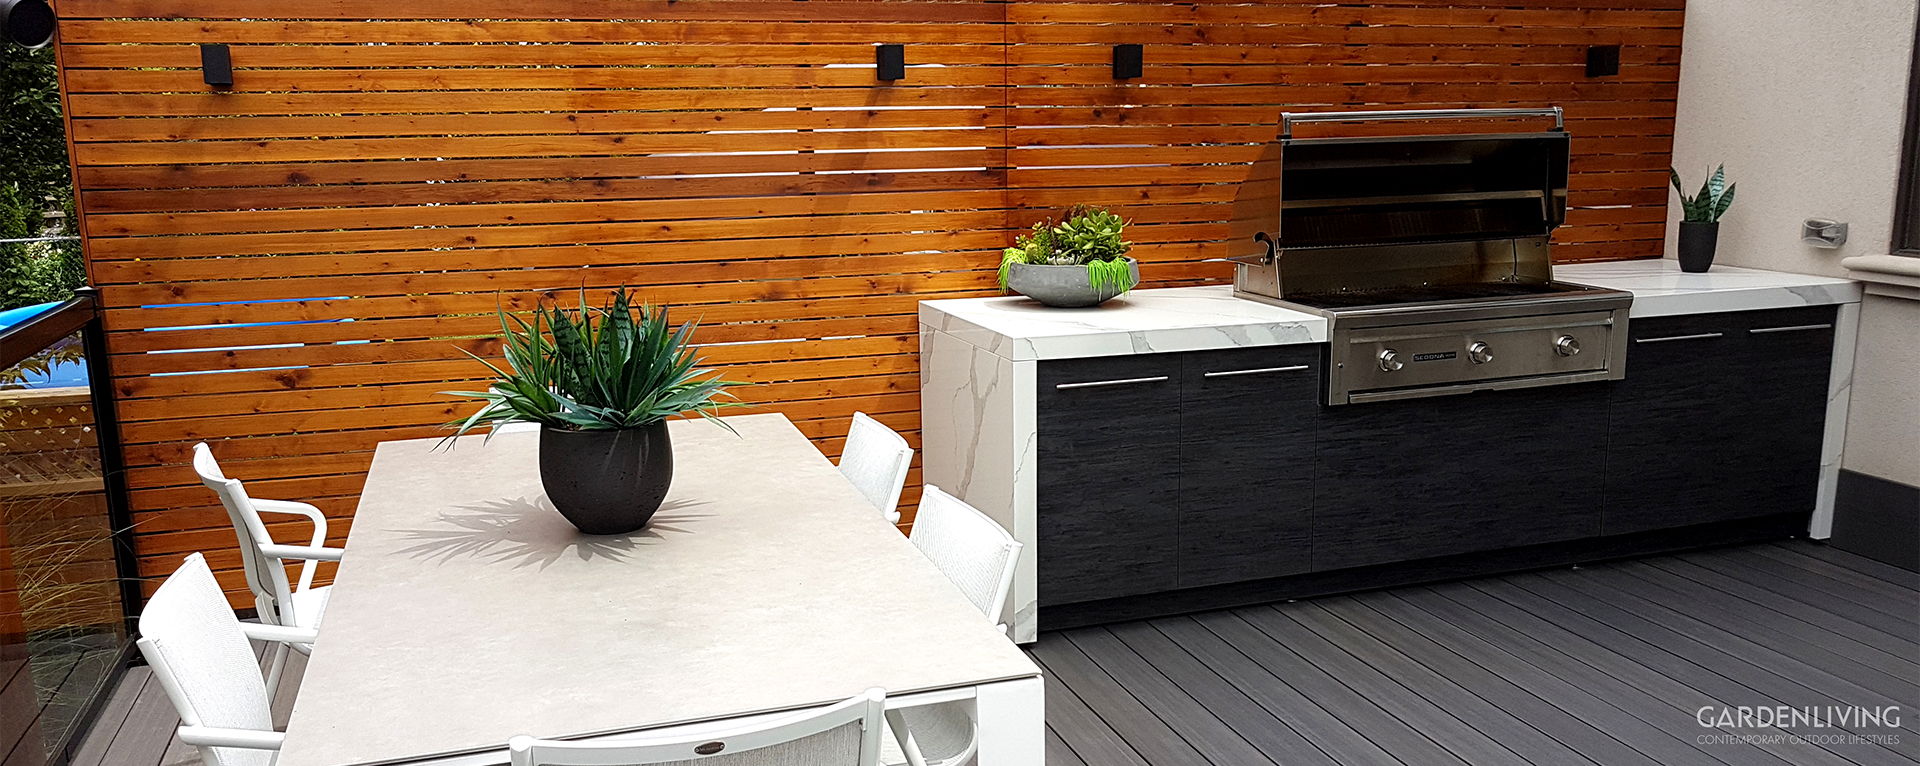 Garden Living Outdoor Kitchen 5.jpg